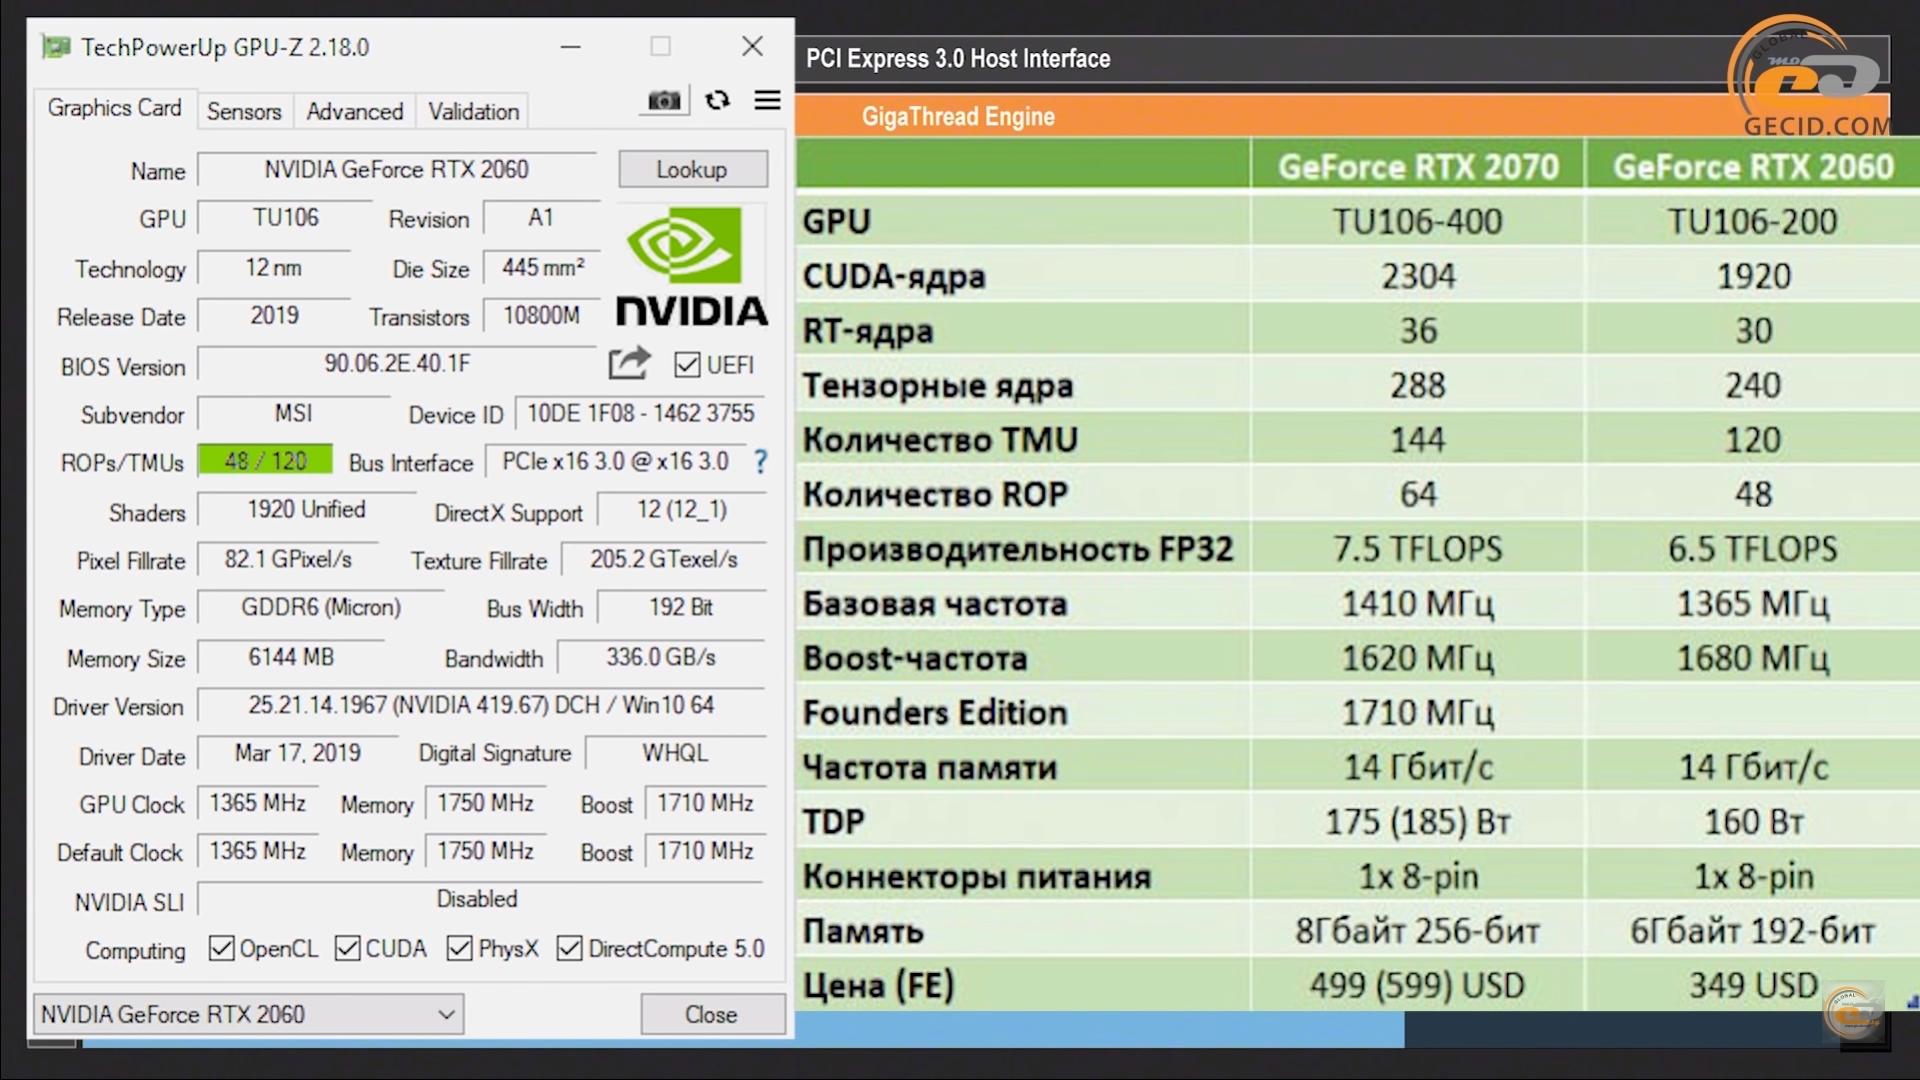 Сравнение GeForce RTX 2060 с RTX 2070, GTX 1070 Ti и RX Vega